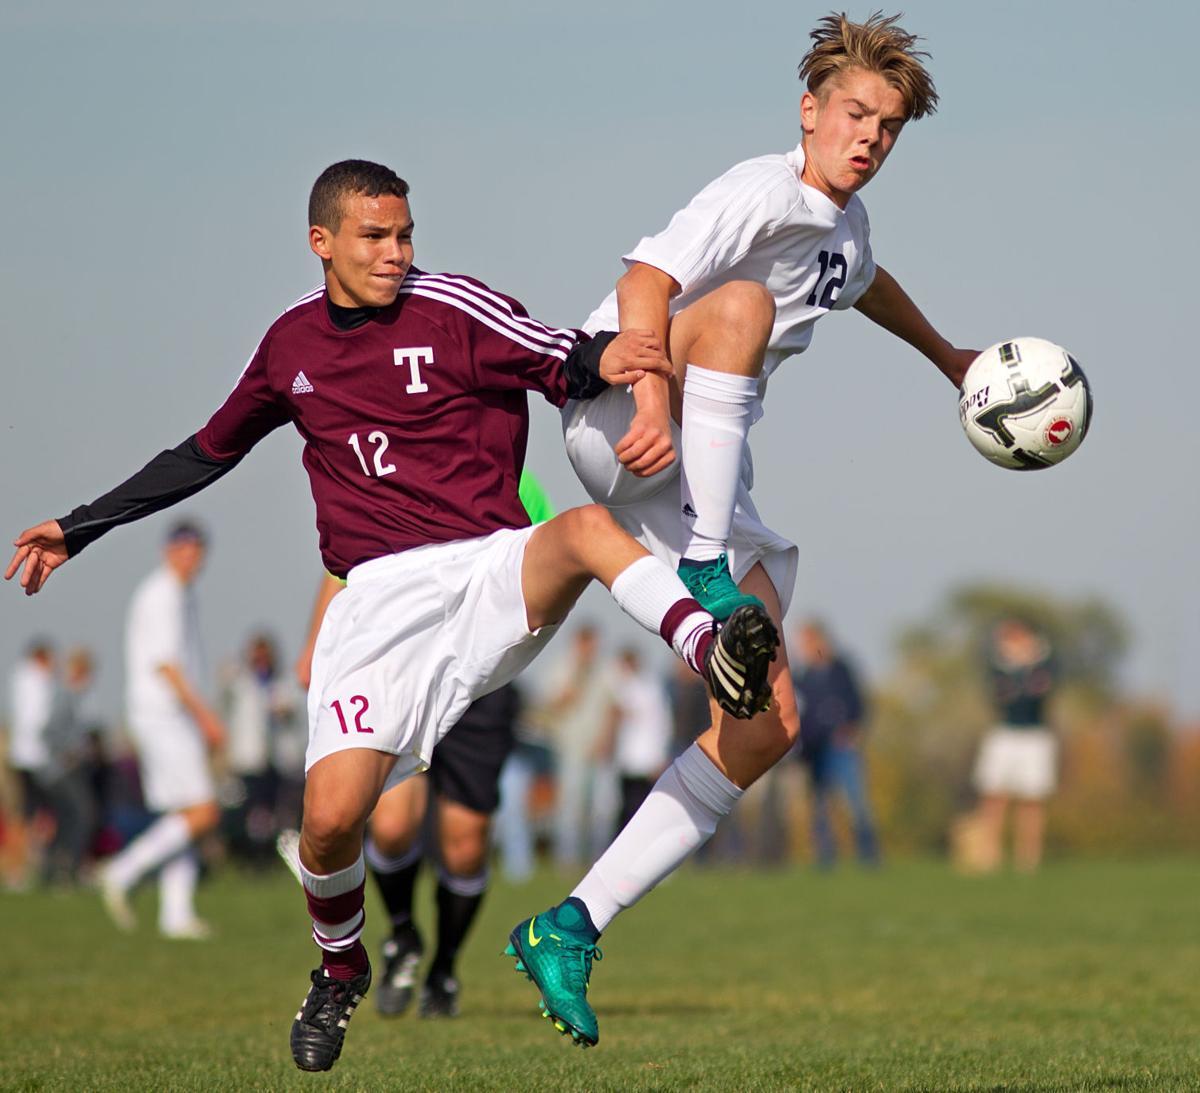 Community vs. Teton Soccer